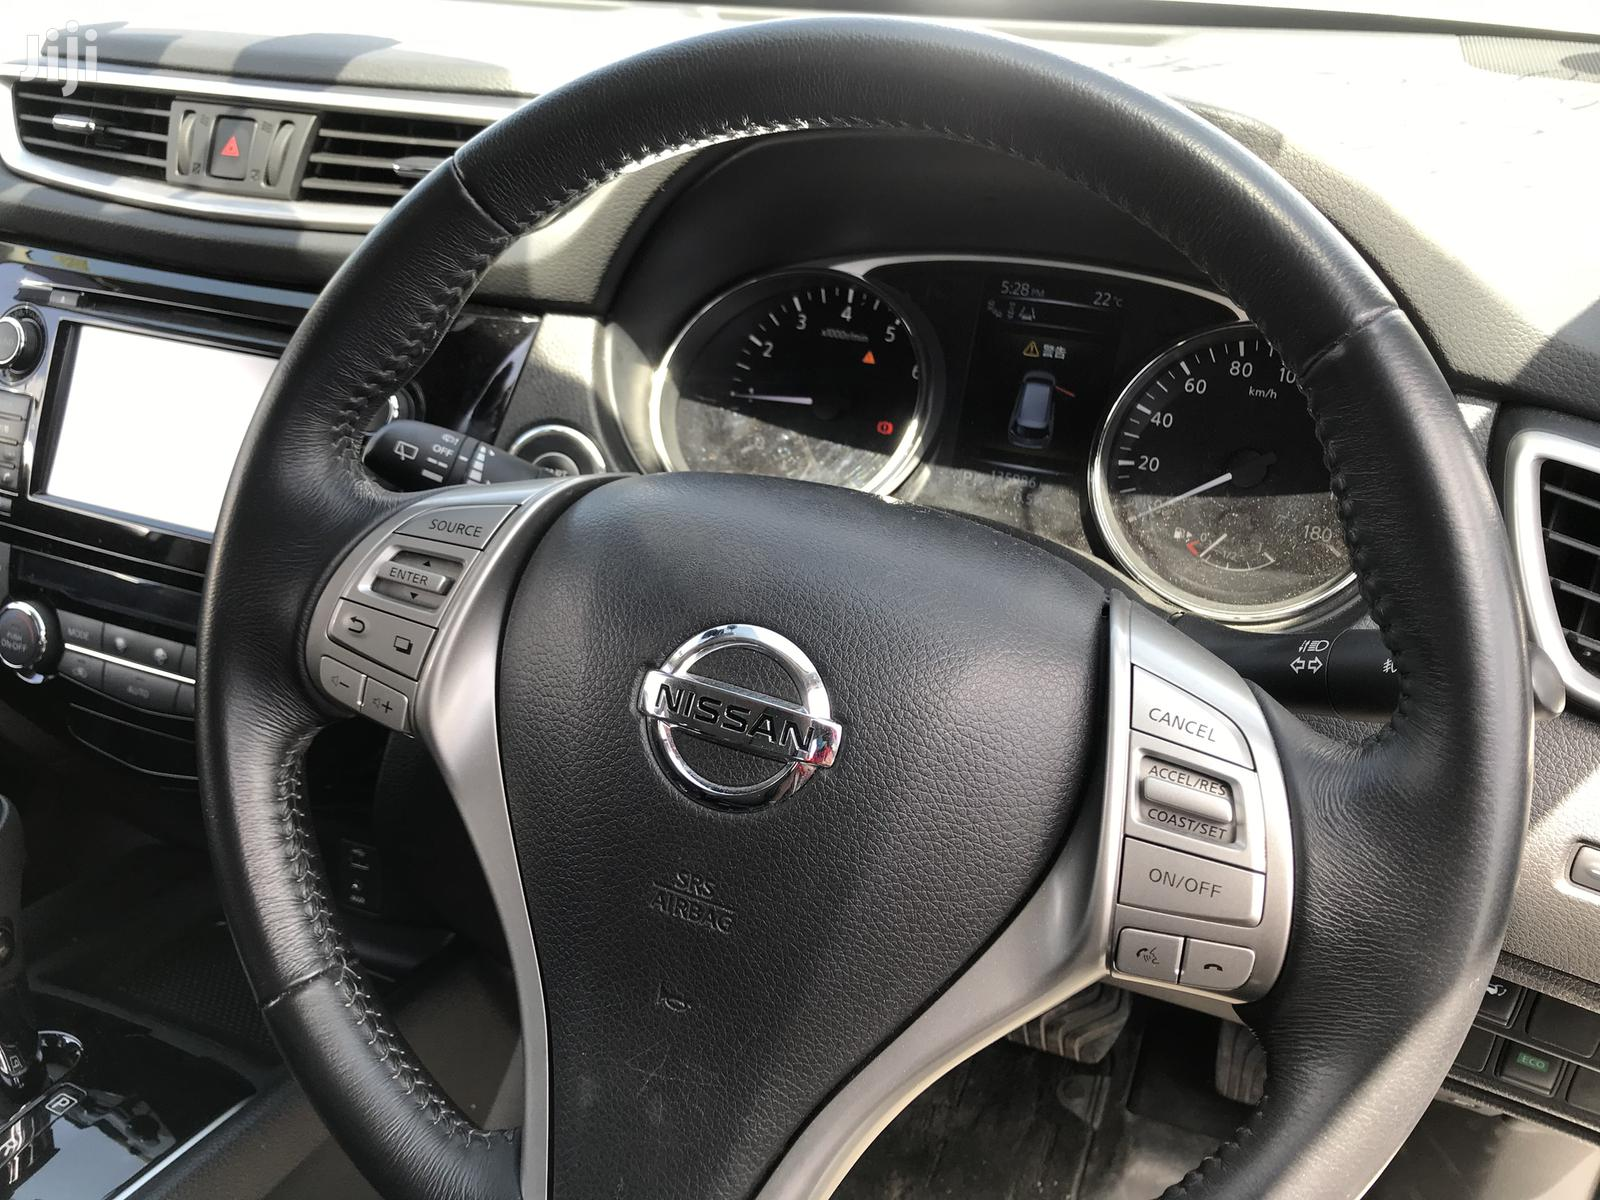 Nissan X-Trail 2014 Silver | Cars for sale in Kilimani, Nairobi, Kenya